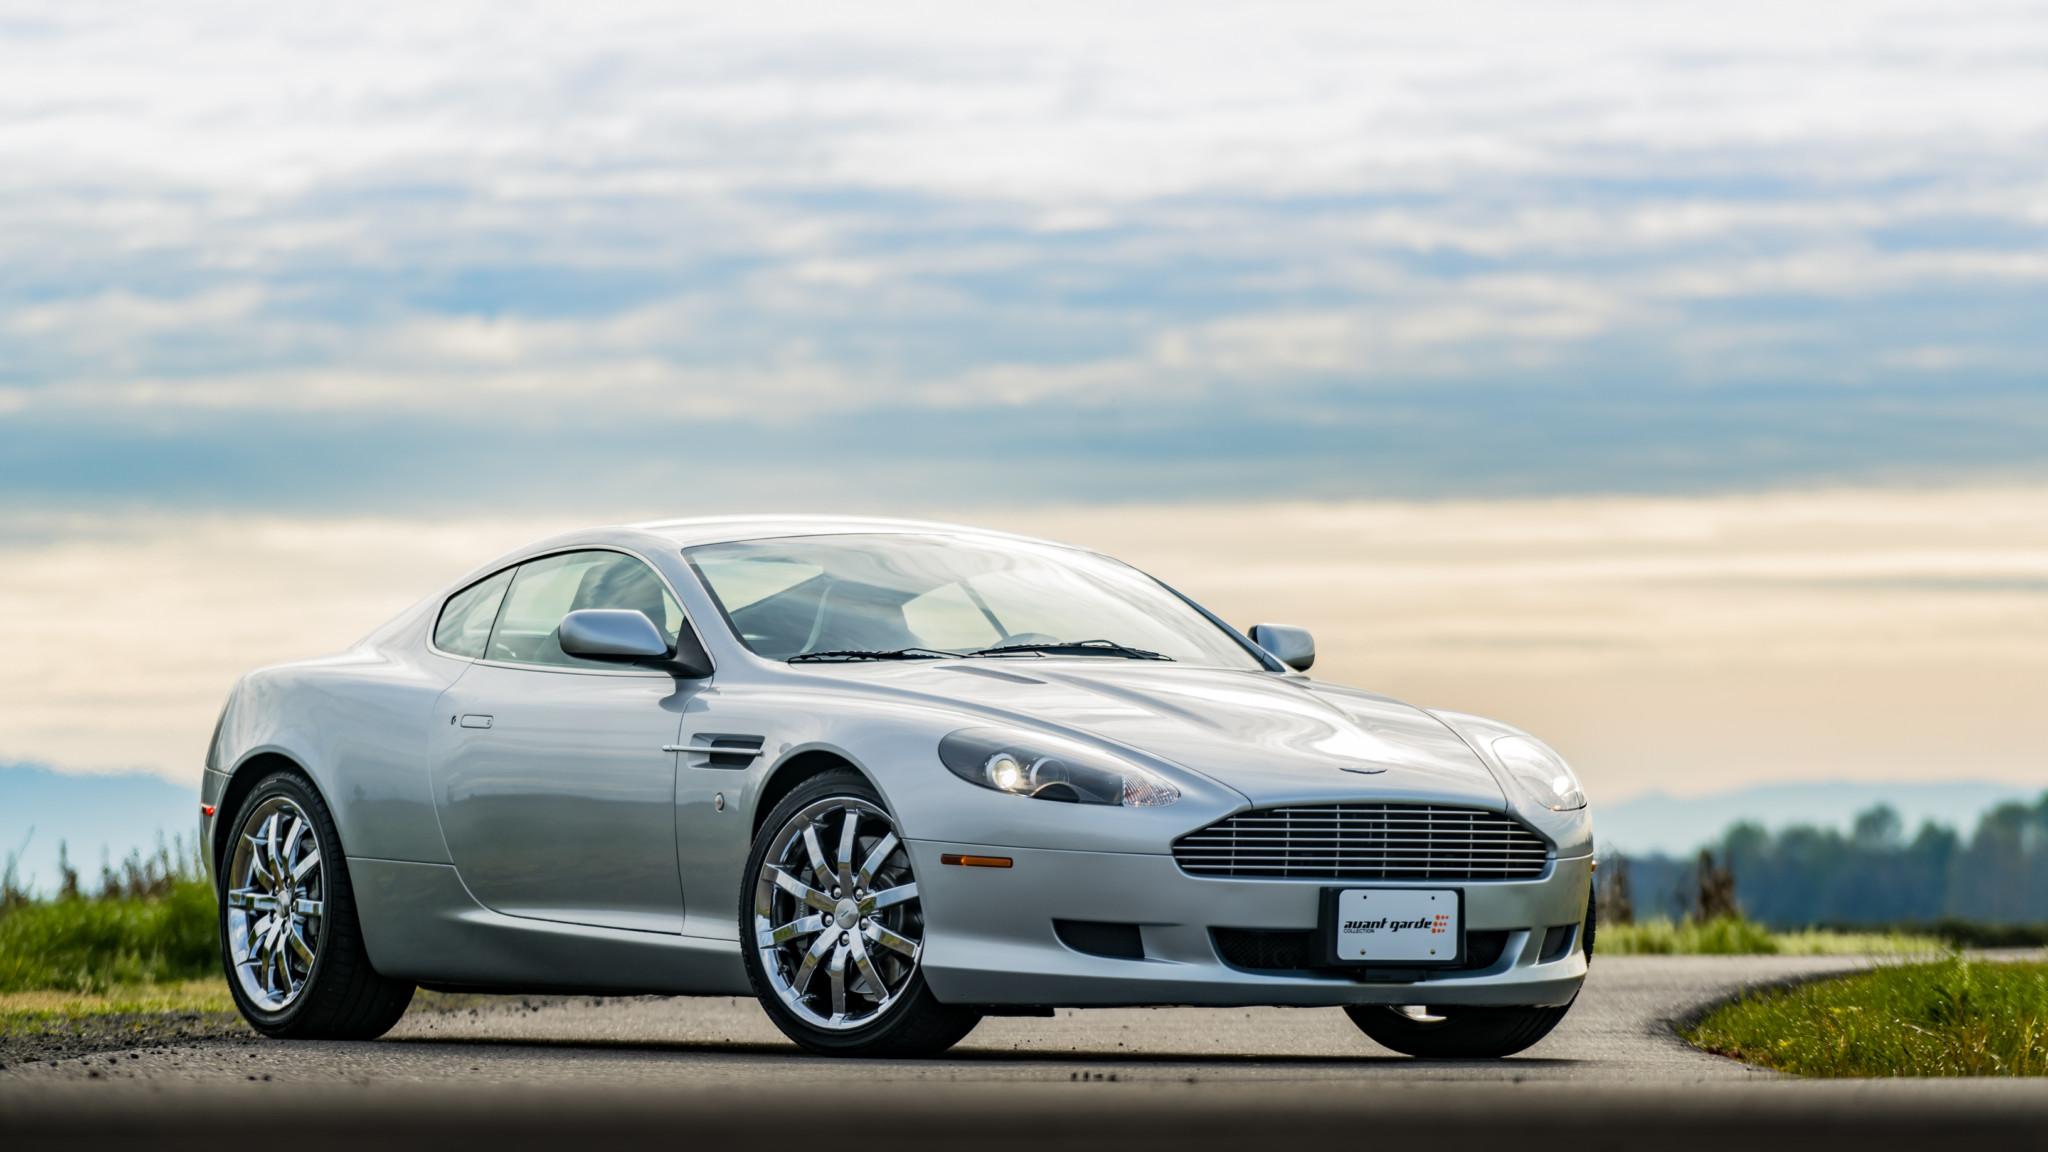 2005 Aston Martin Db9 Coupe Papel De Parede Hd Plano De Fundo 2048x1152 Id 1015047 Wallpaper Abyss